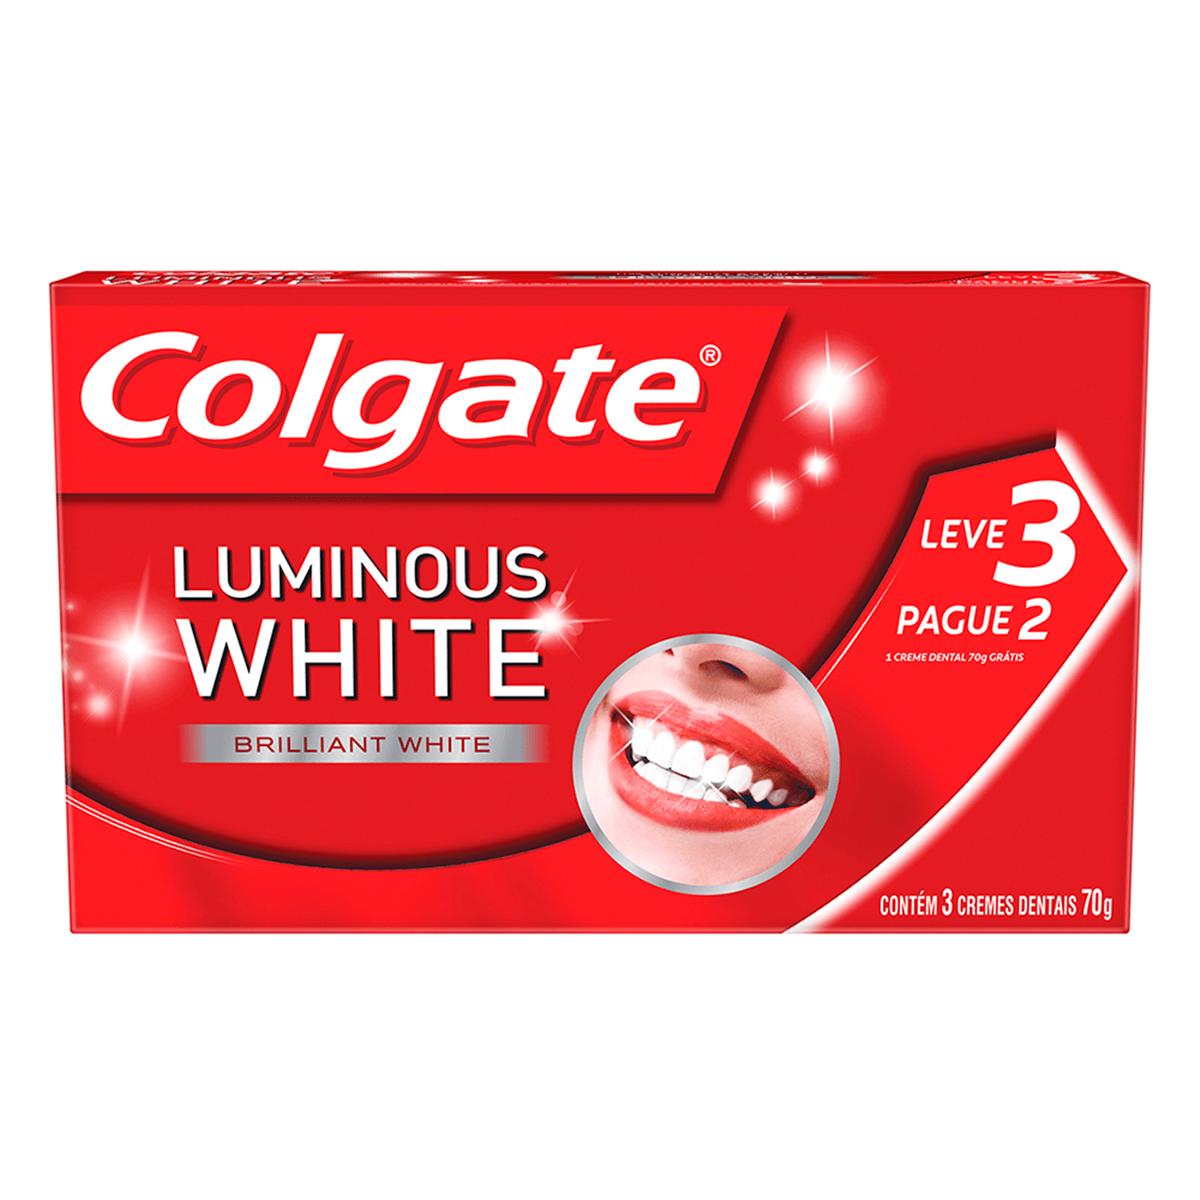 Kit Colgate Creme Dental Luminous White Brilliant White 1 Unidade